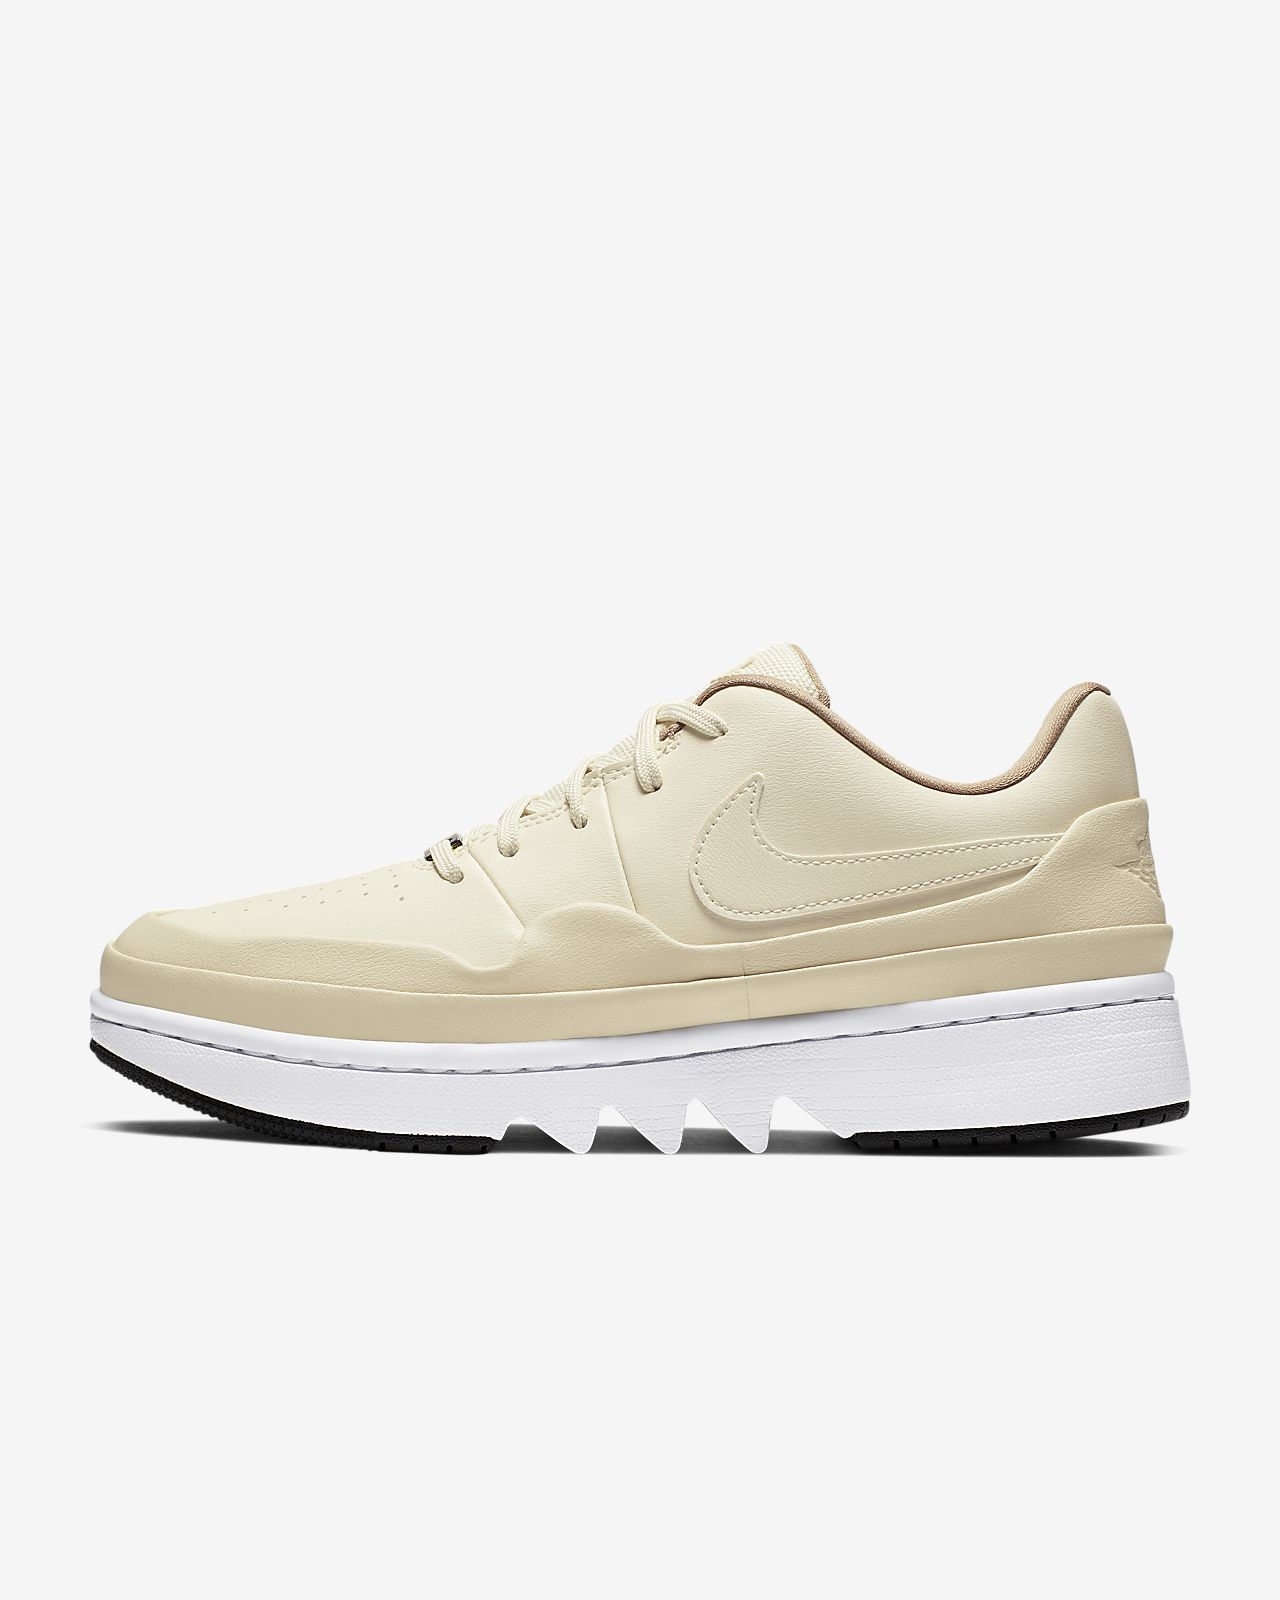 Air Jordan 1 Jester XX Low Laced női cipő